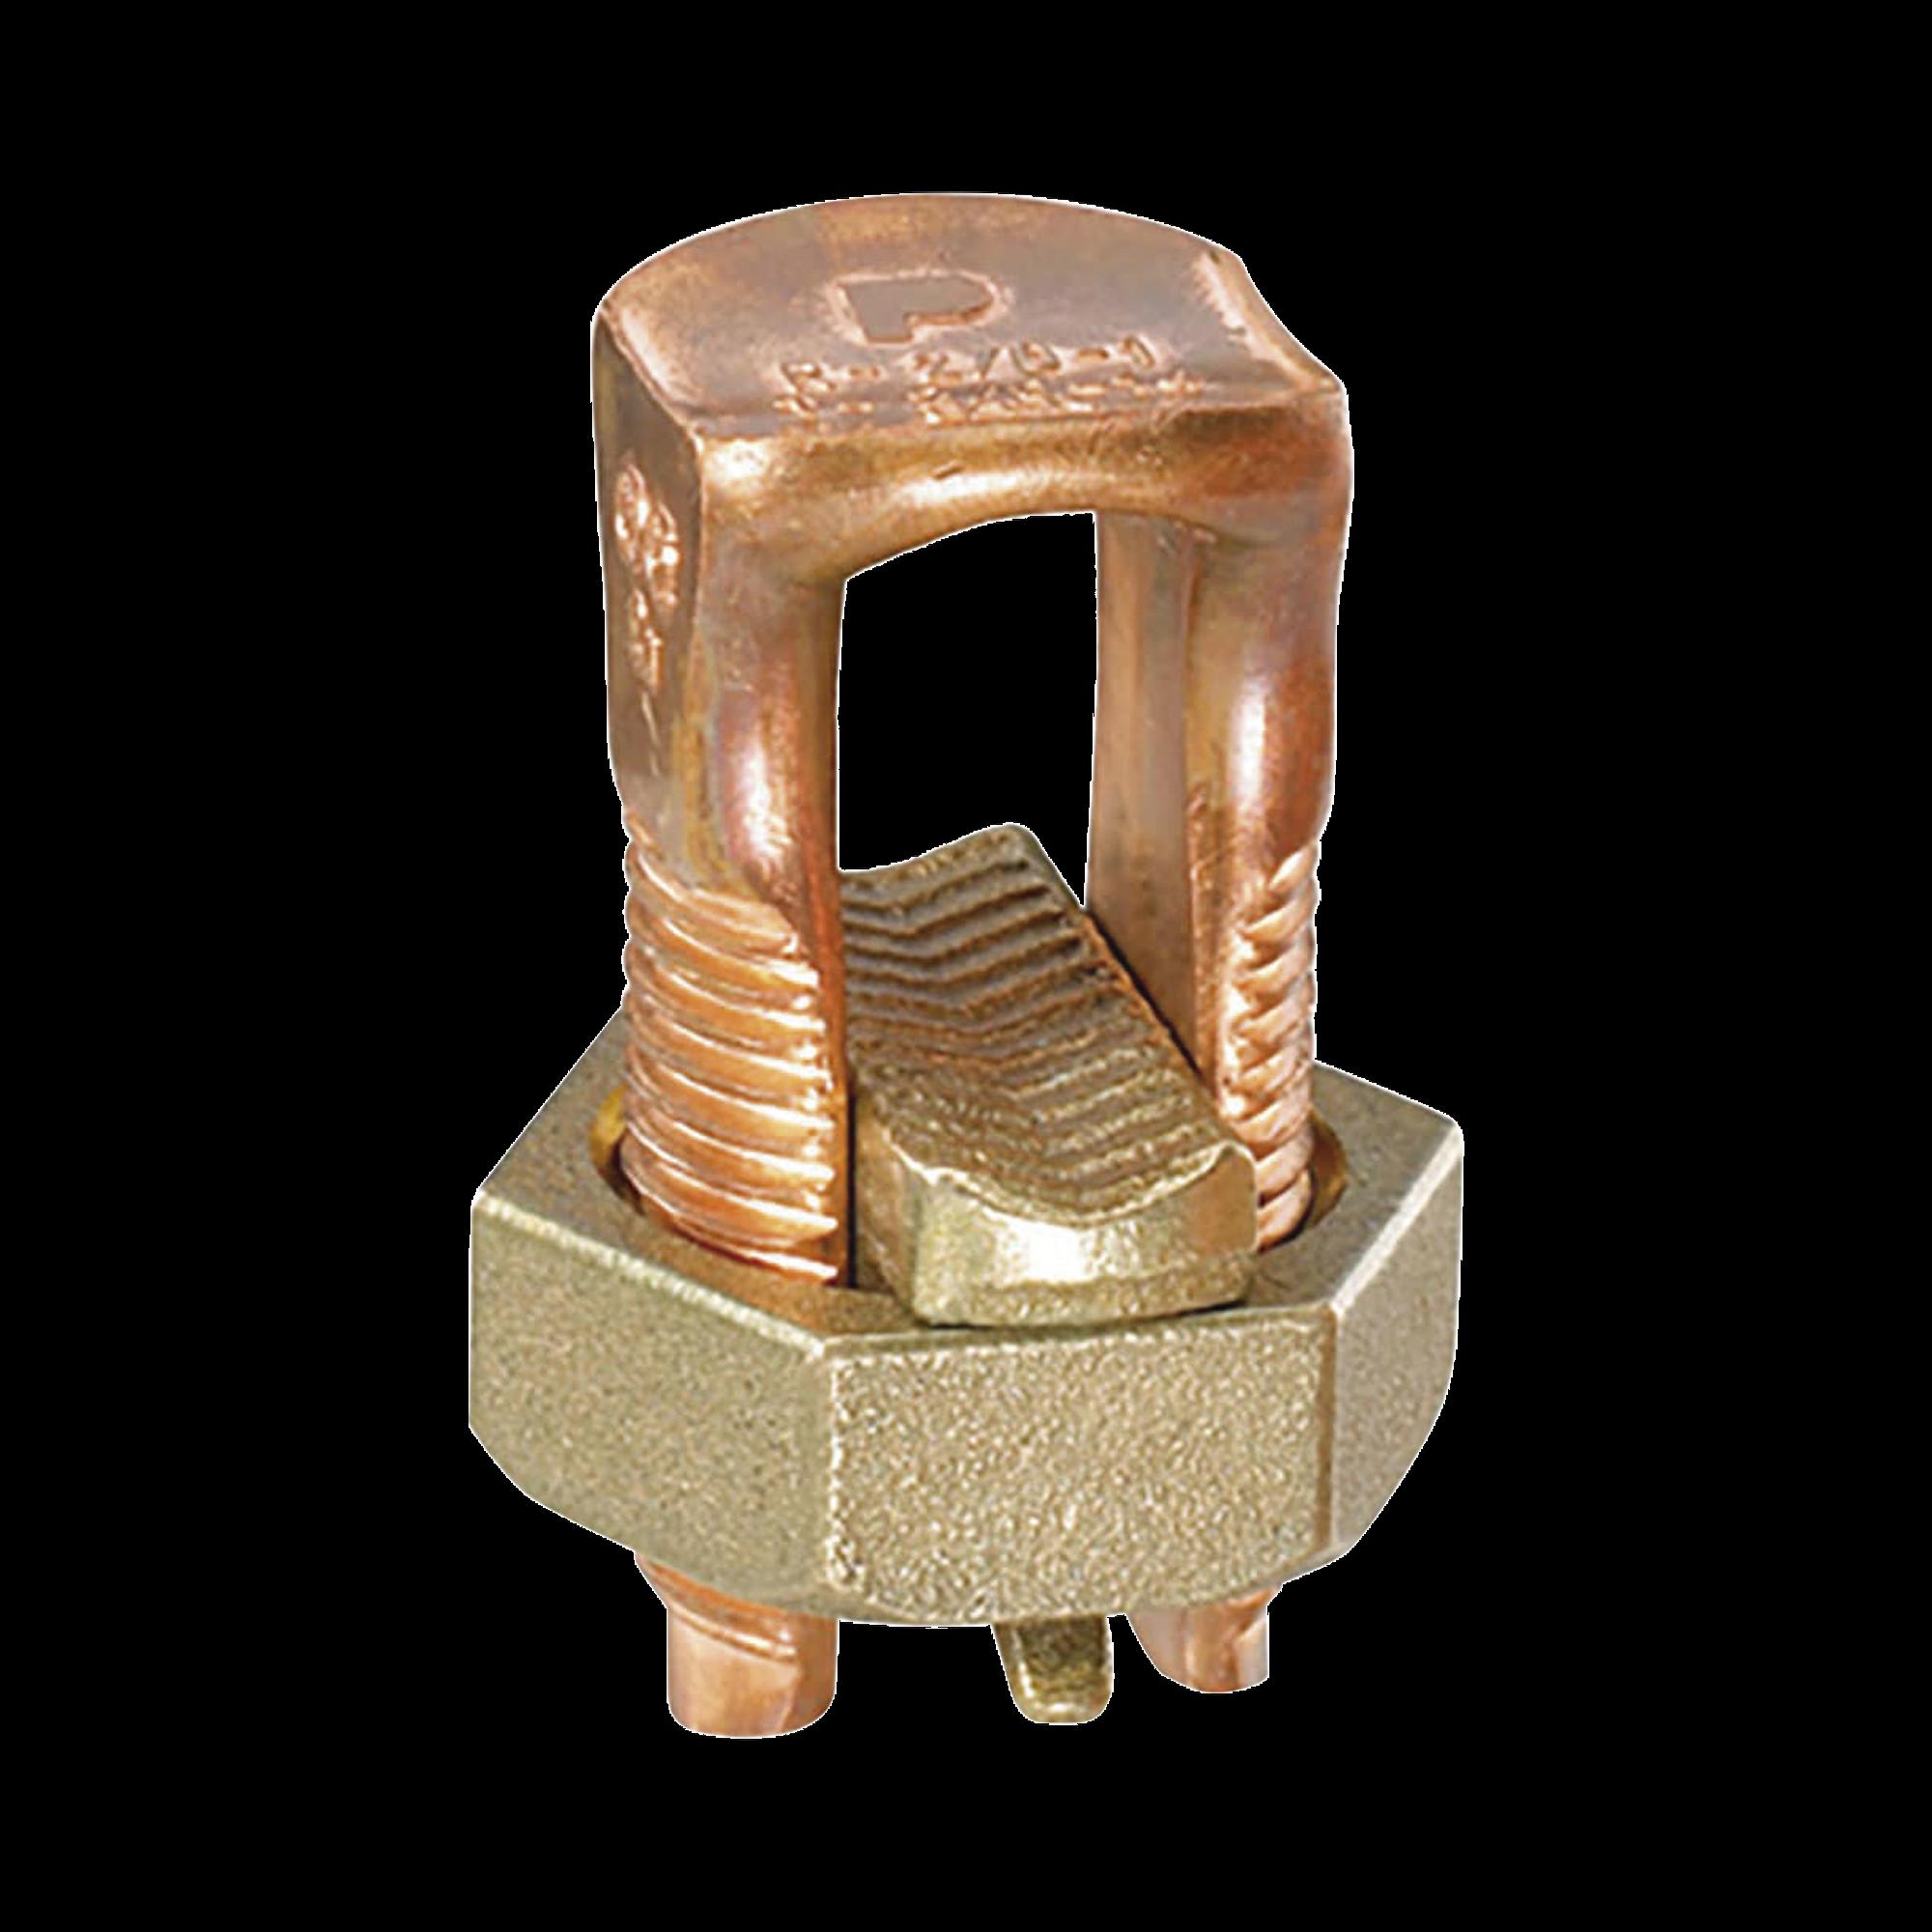 Conector Mecánico de Puesta a Tierra, de Cobre, Para Cables de Calibre 4 a 1/0 AWG